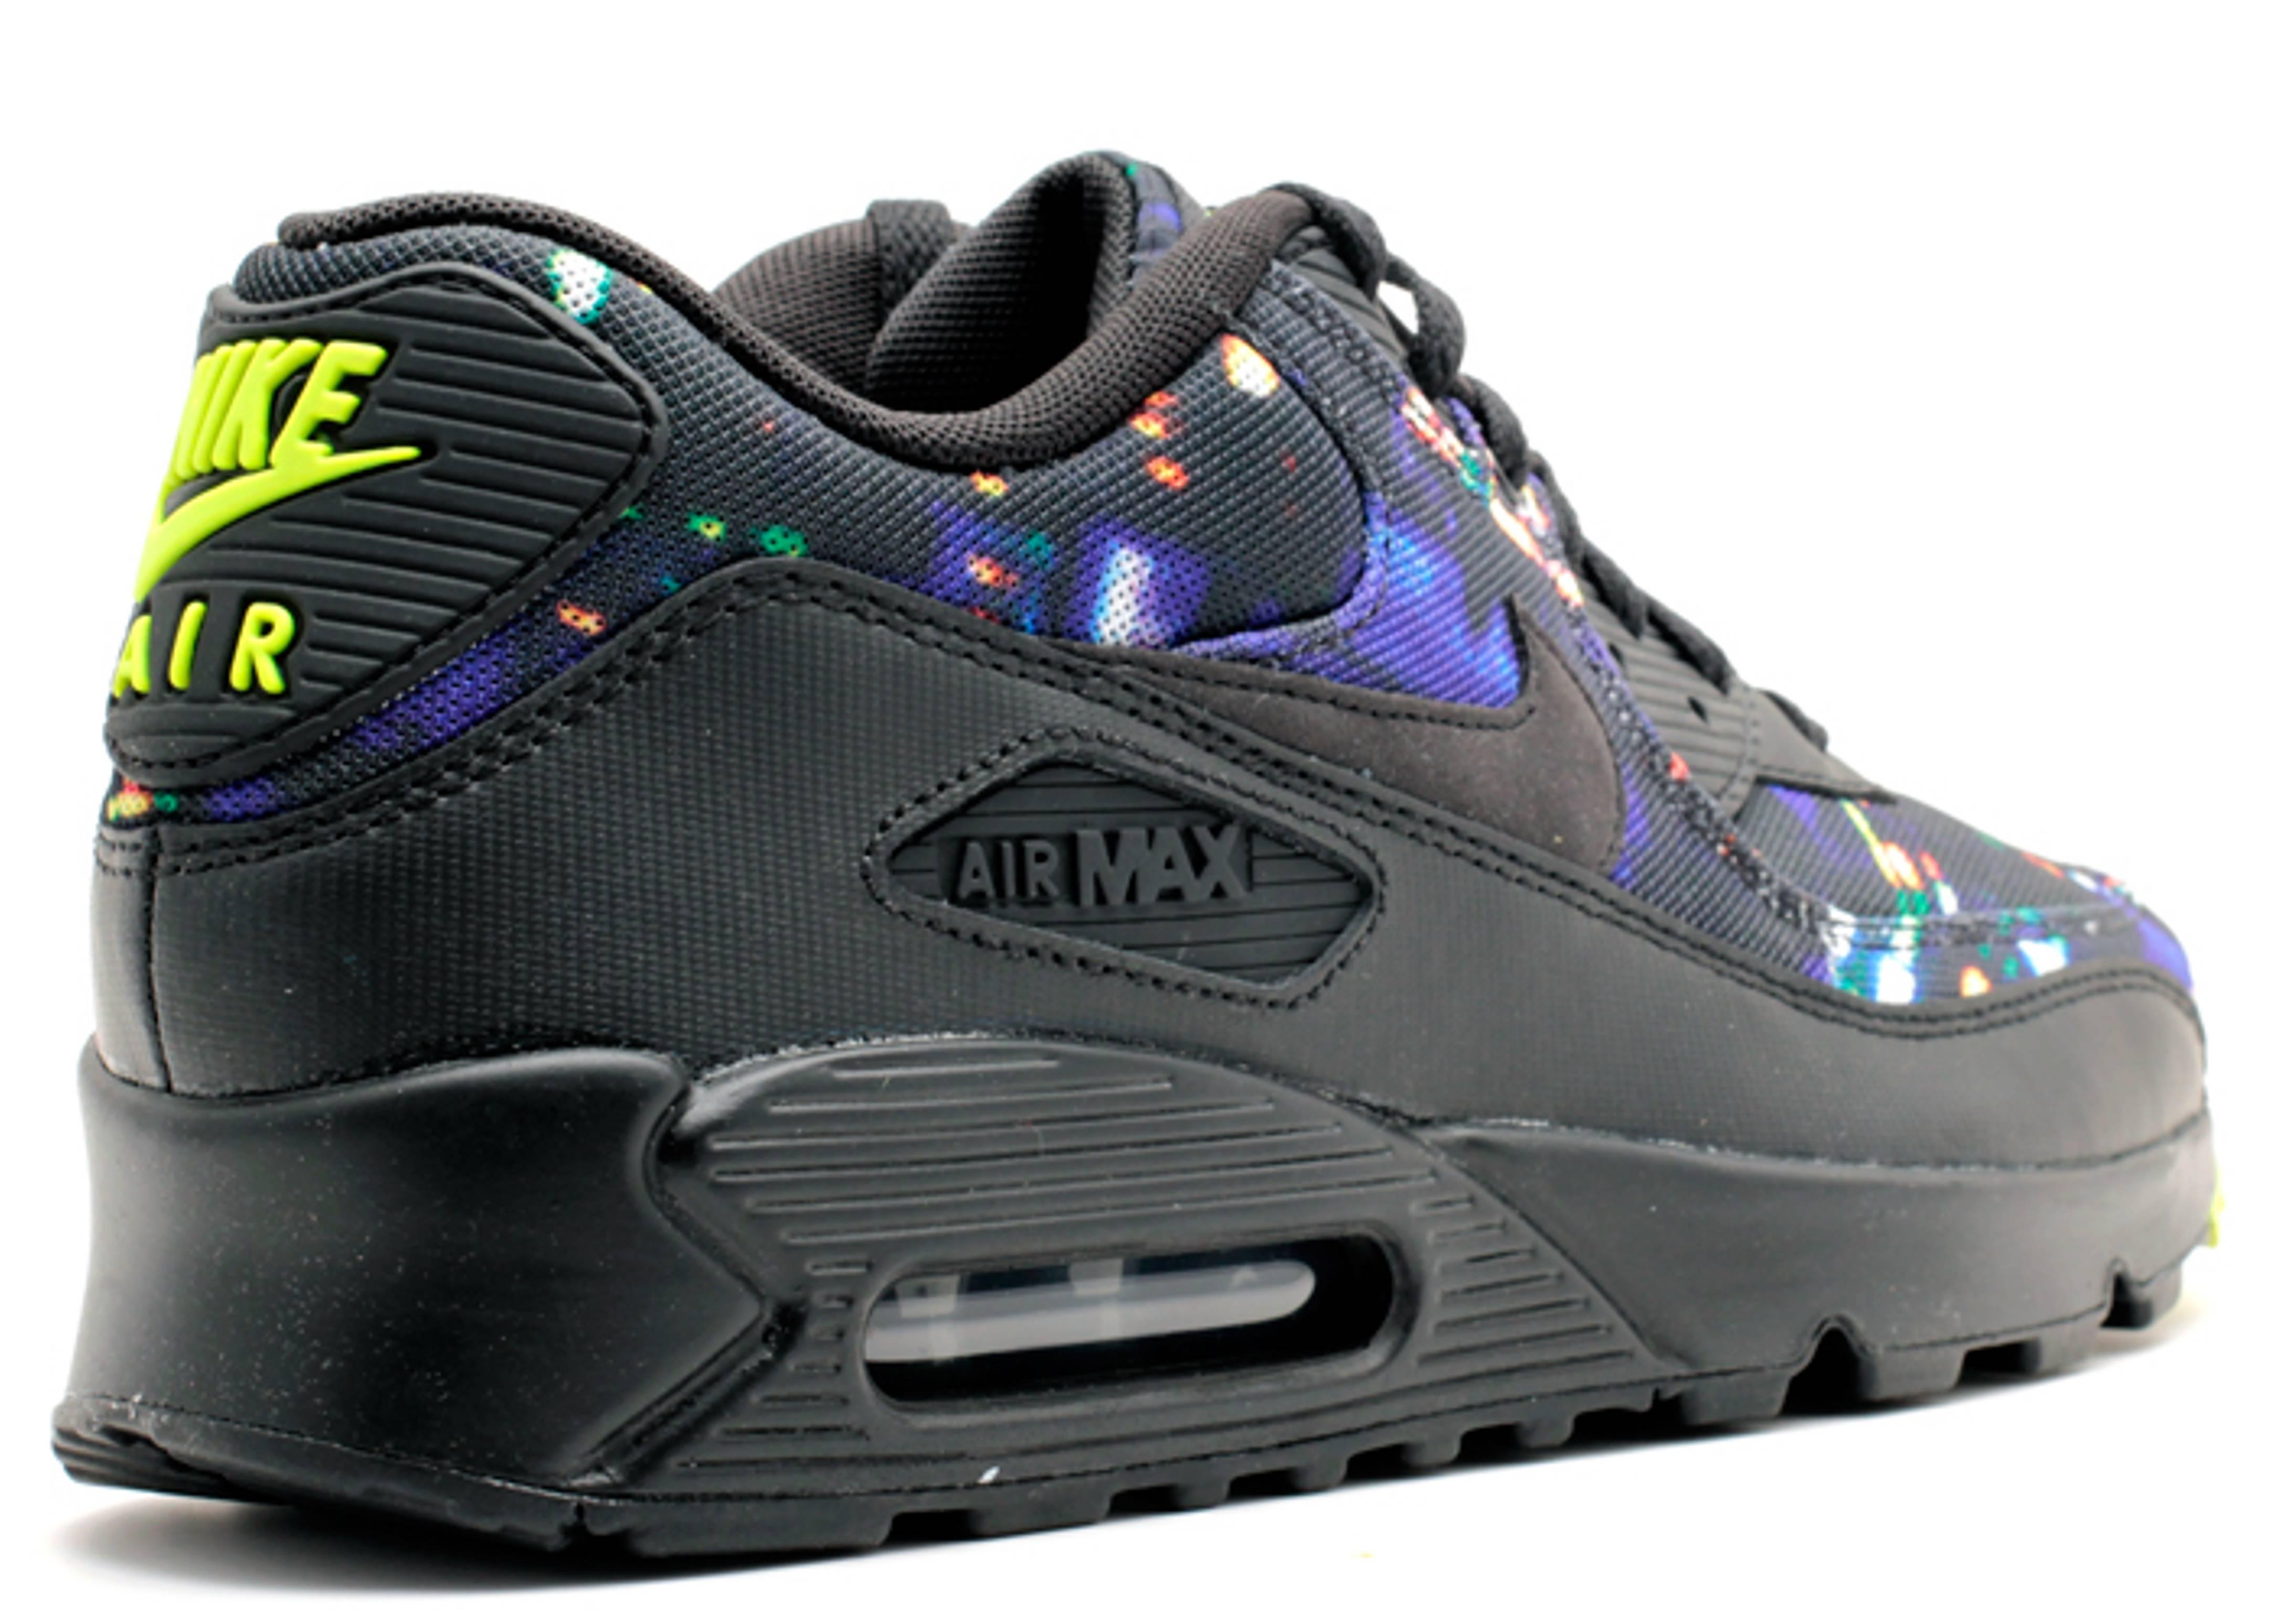 free shipping 43441 2e765 Air Max 90 Prm - Nike - 700155 070 - black/black-volt-dark ...